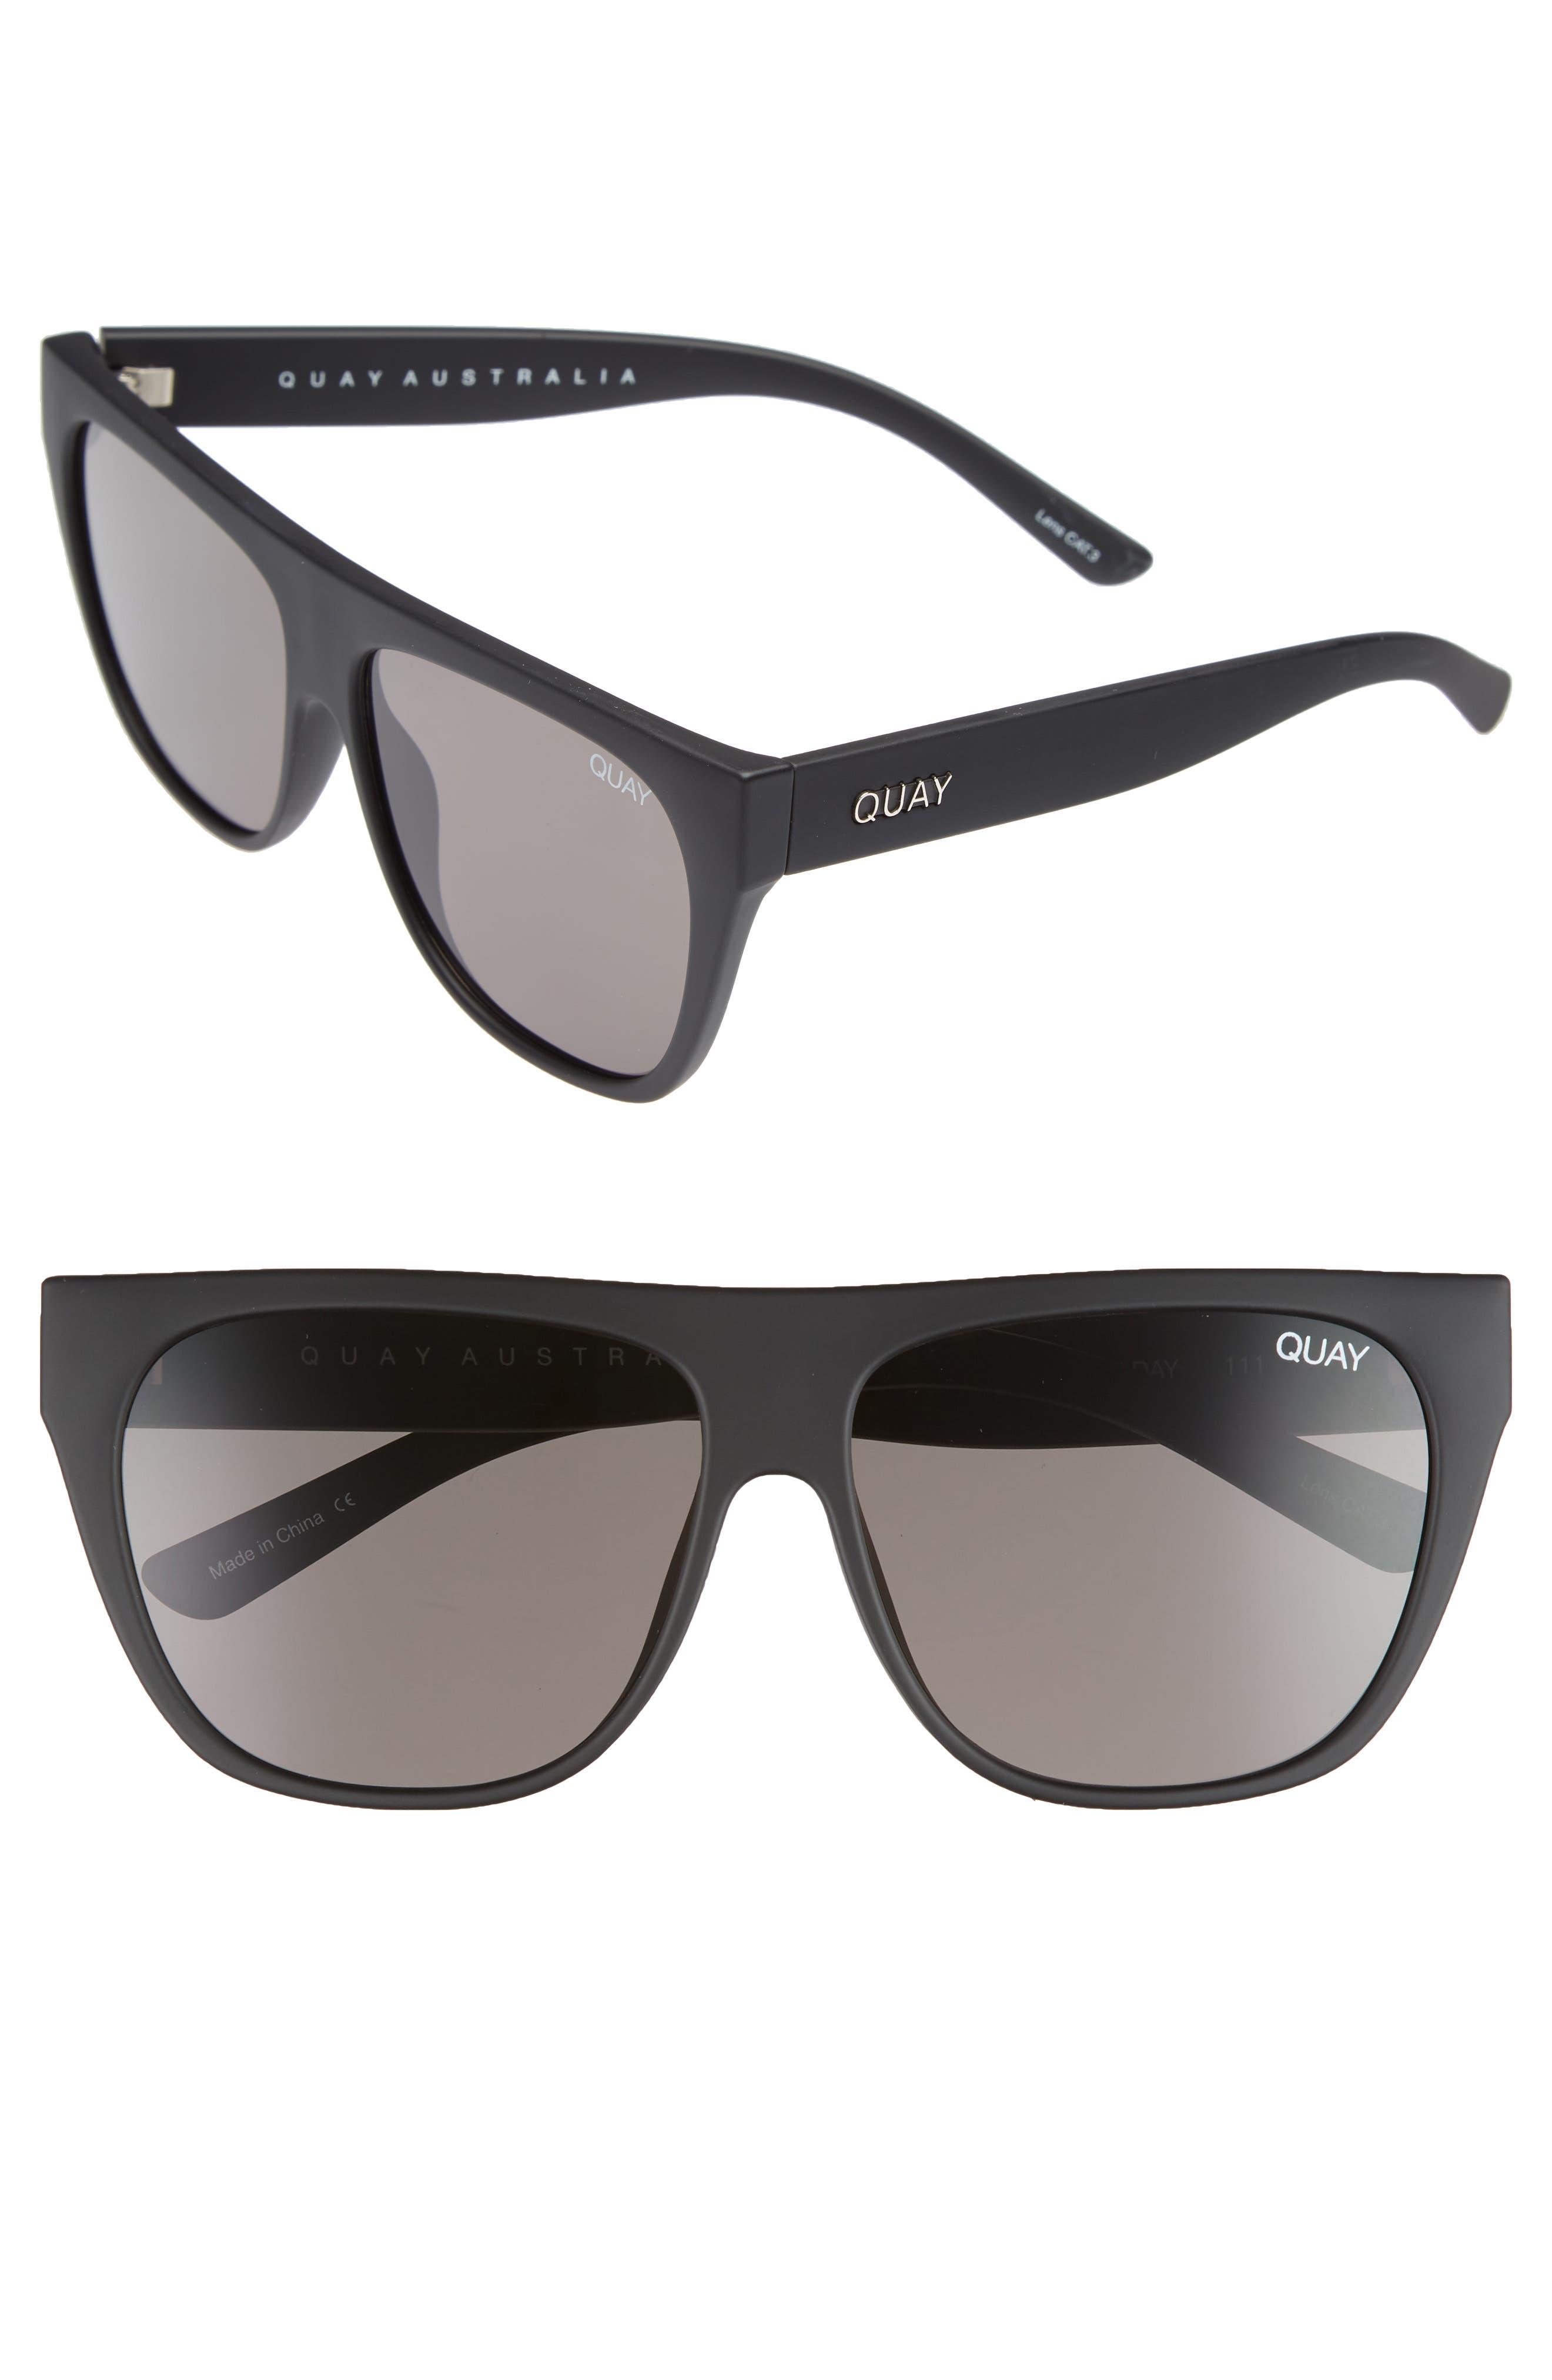 x Tony Bianco Drama by Day 55mm Square Sunglasses,                             Main thumbnail 1, color,                             Black/ Smoke